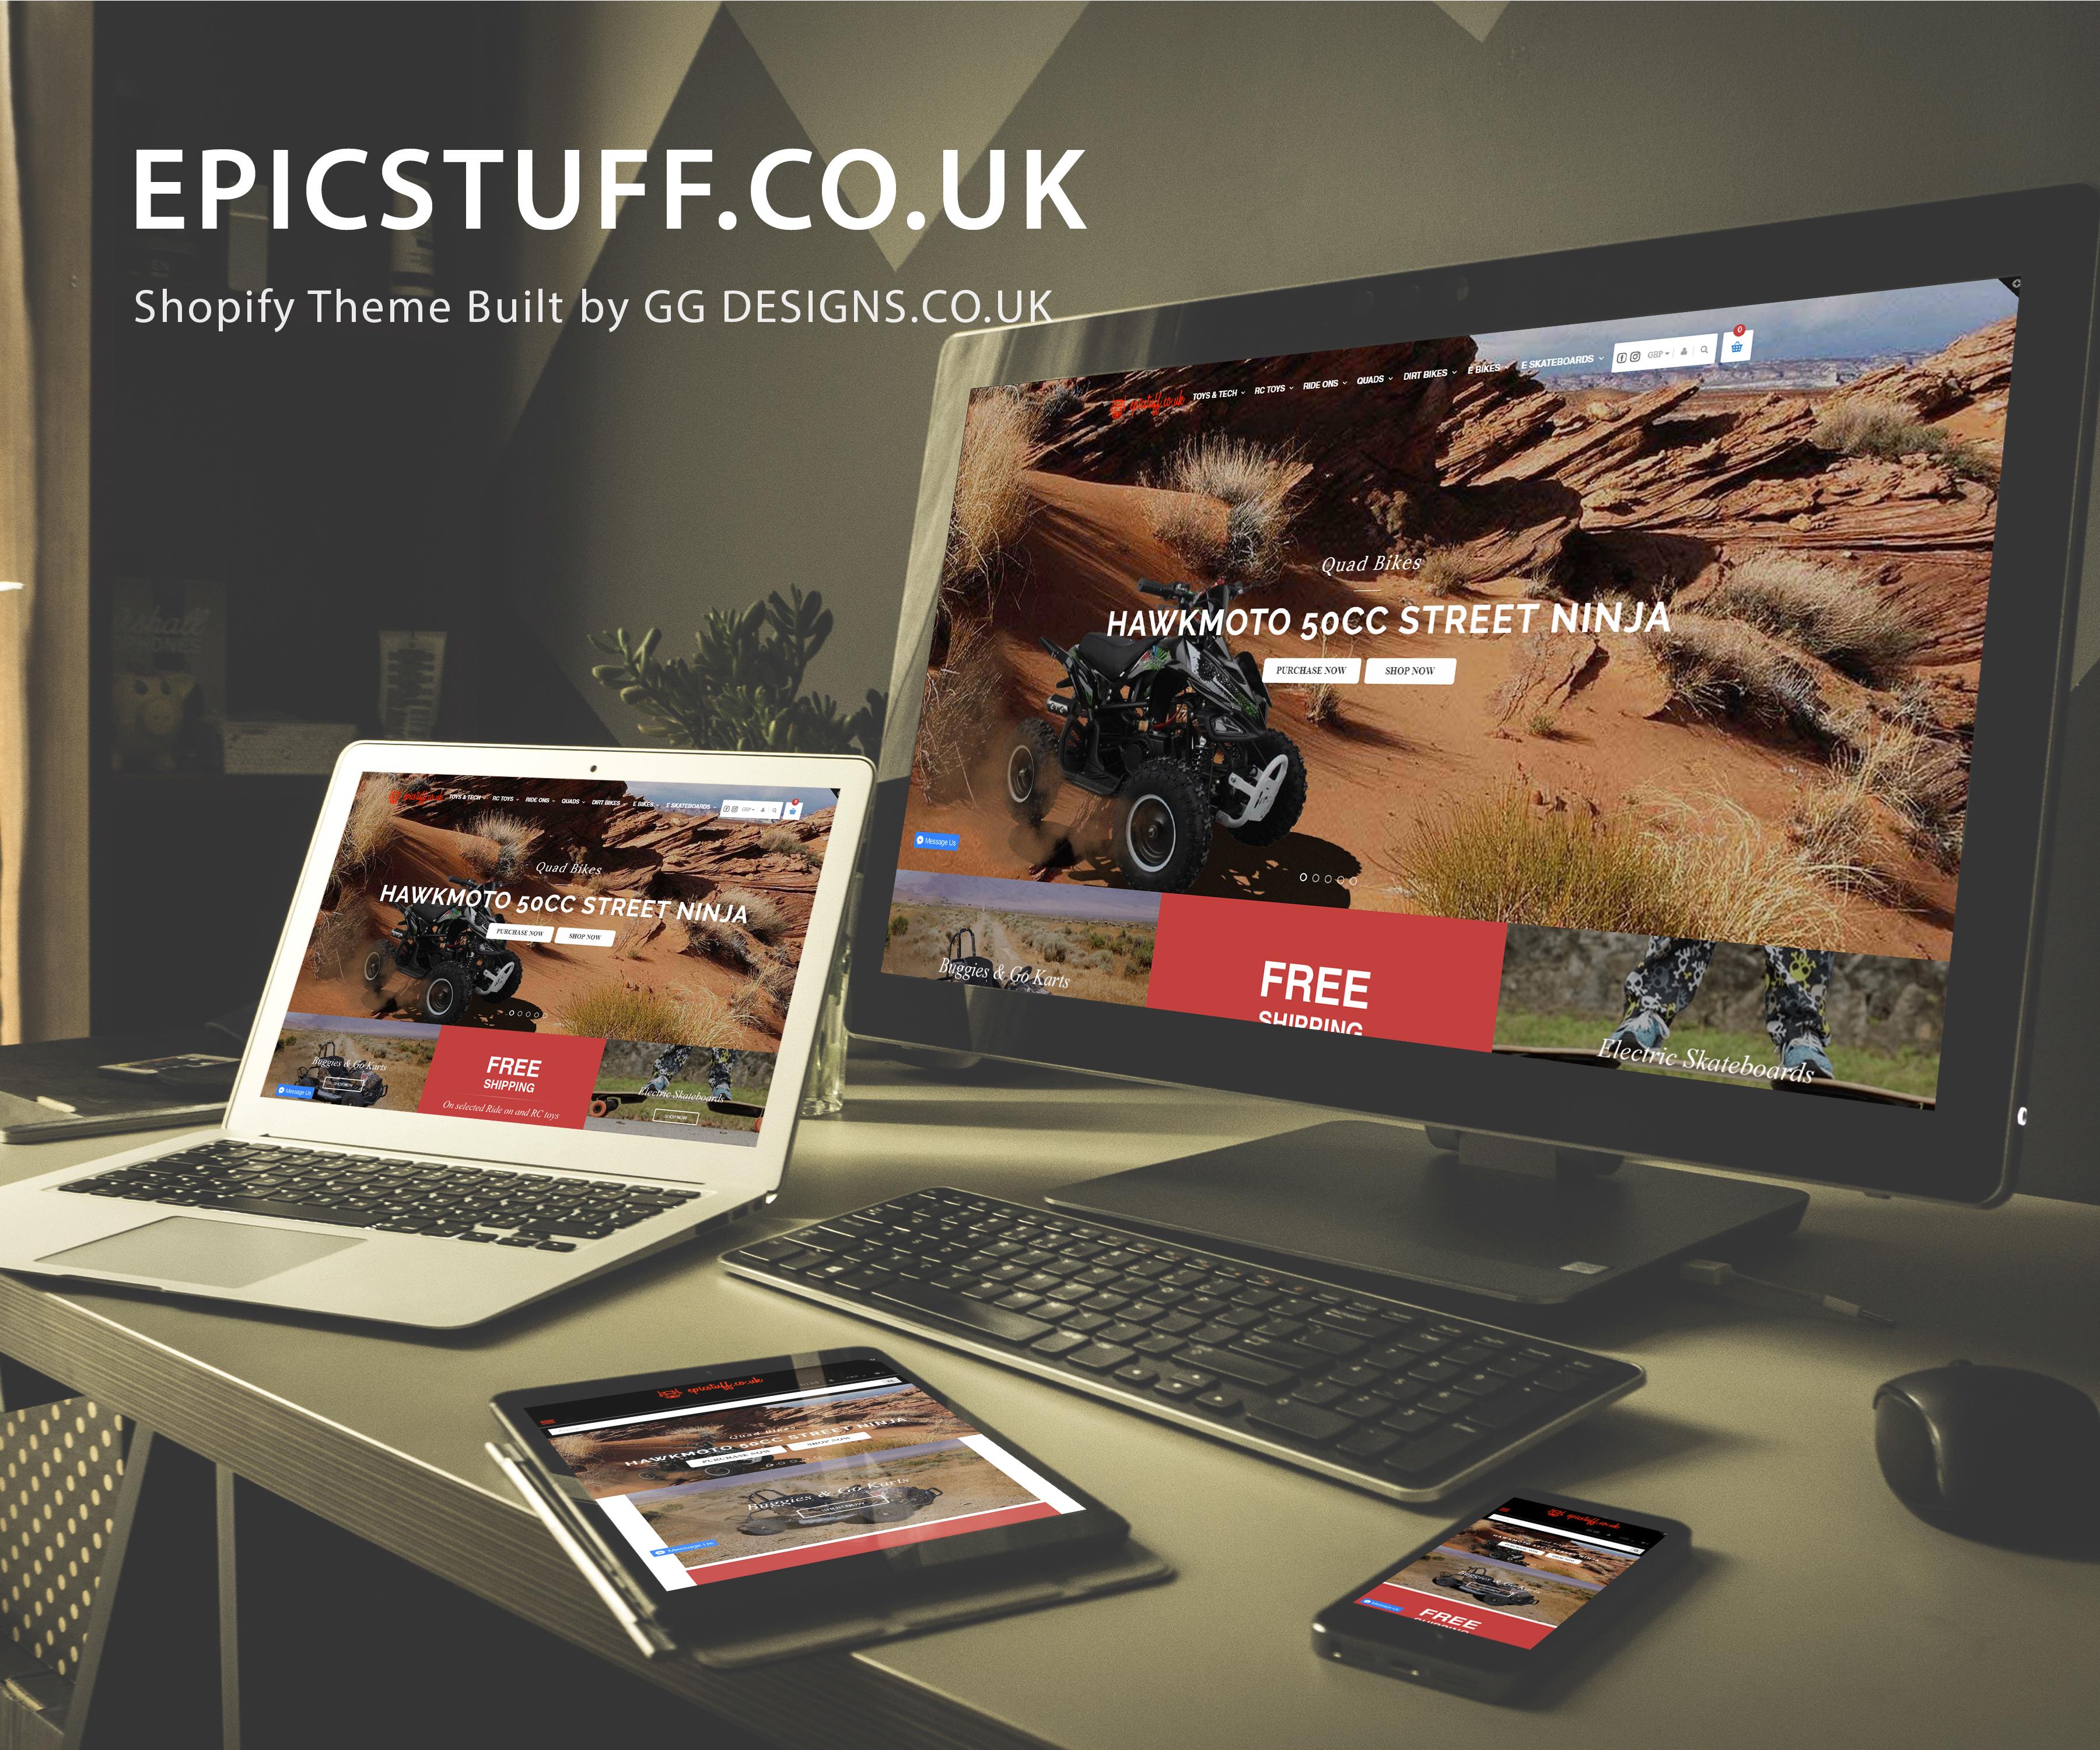 EpicStuff.co.uk Shopify Website Design